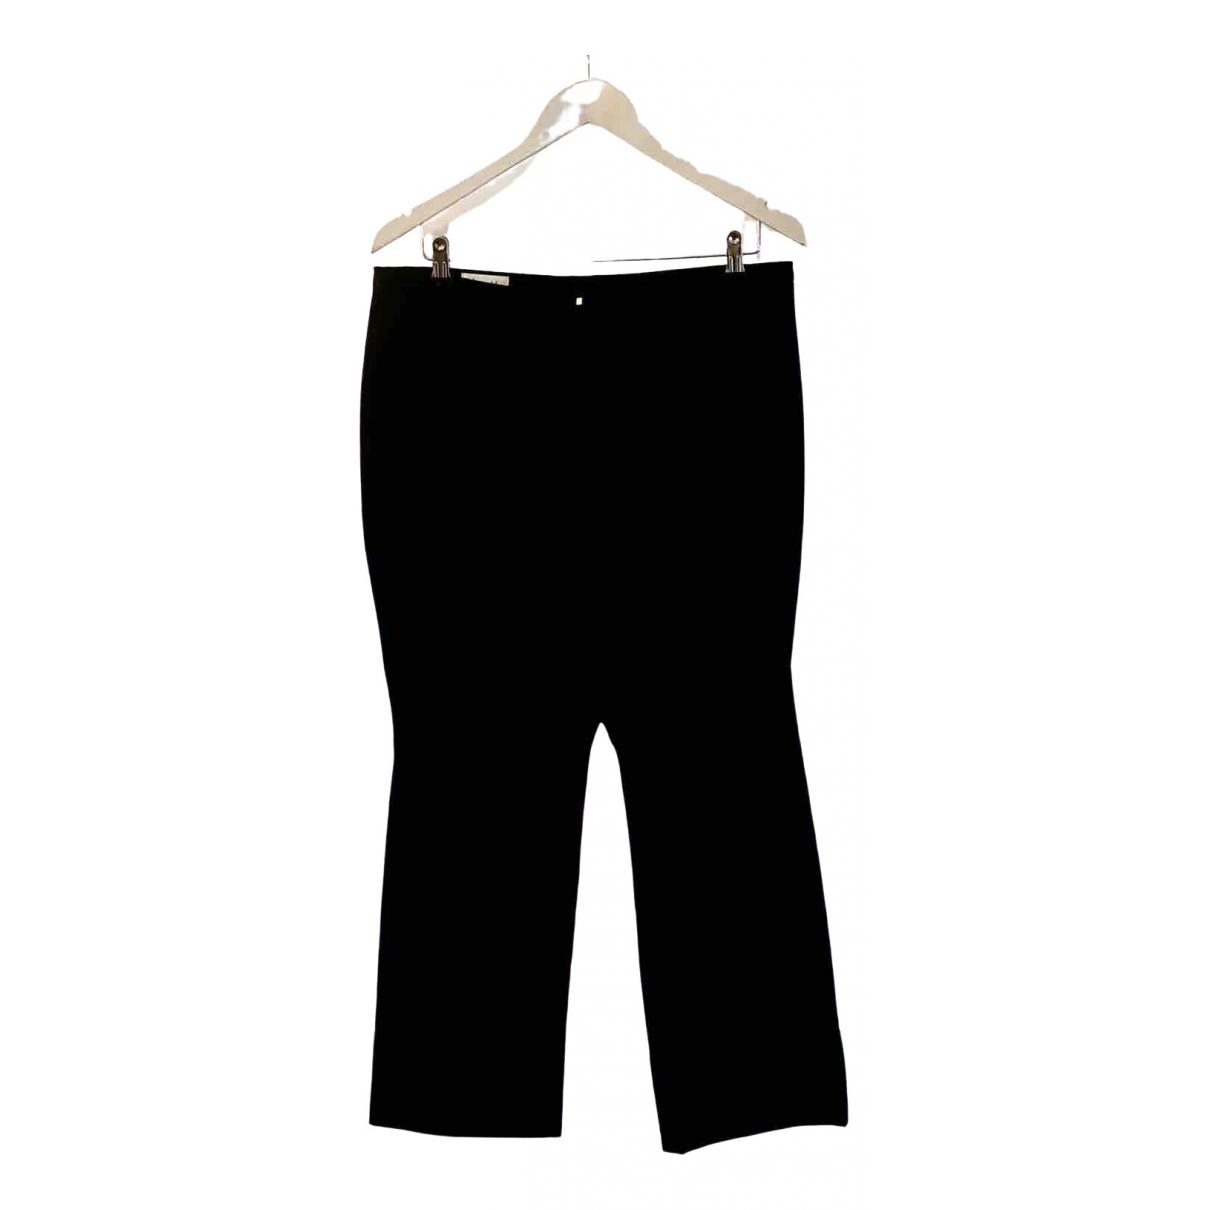 Laurel \N Black Trousers for Women 44 FR